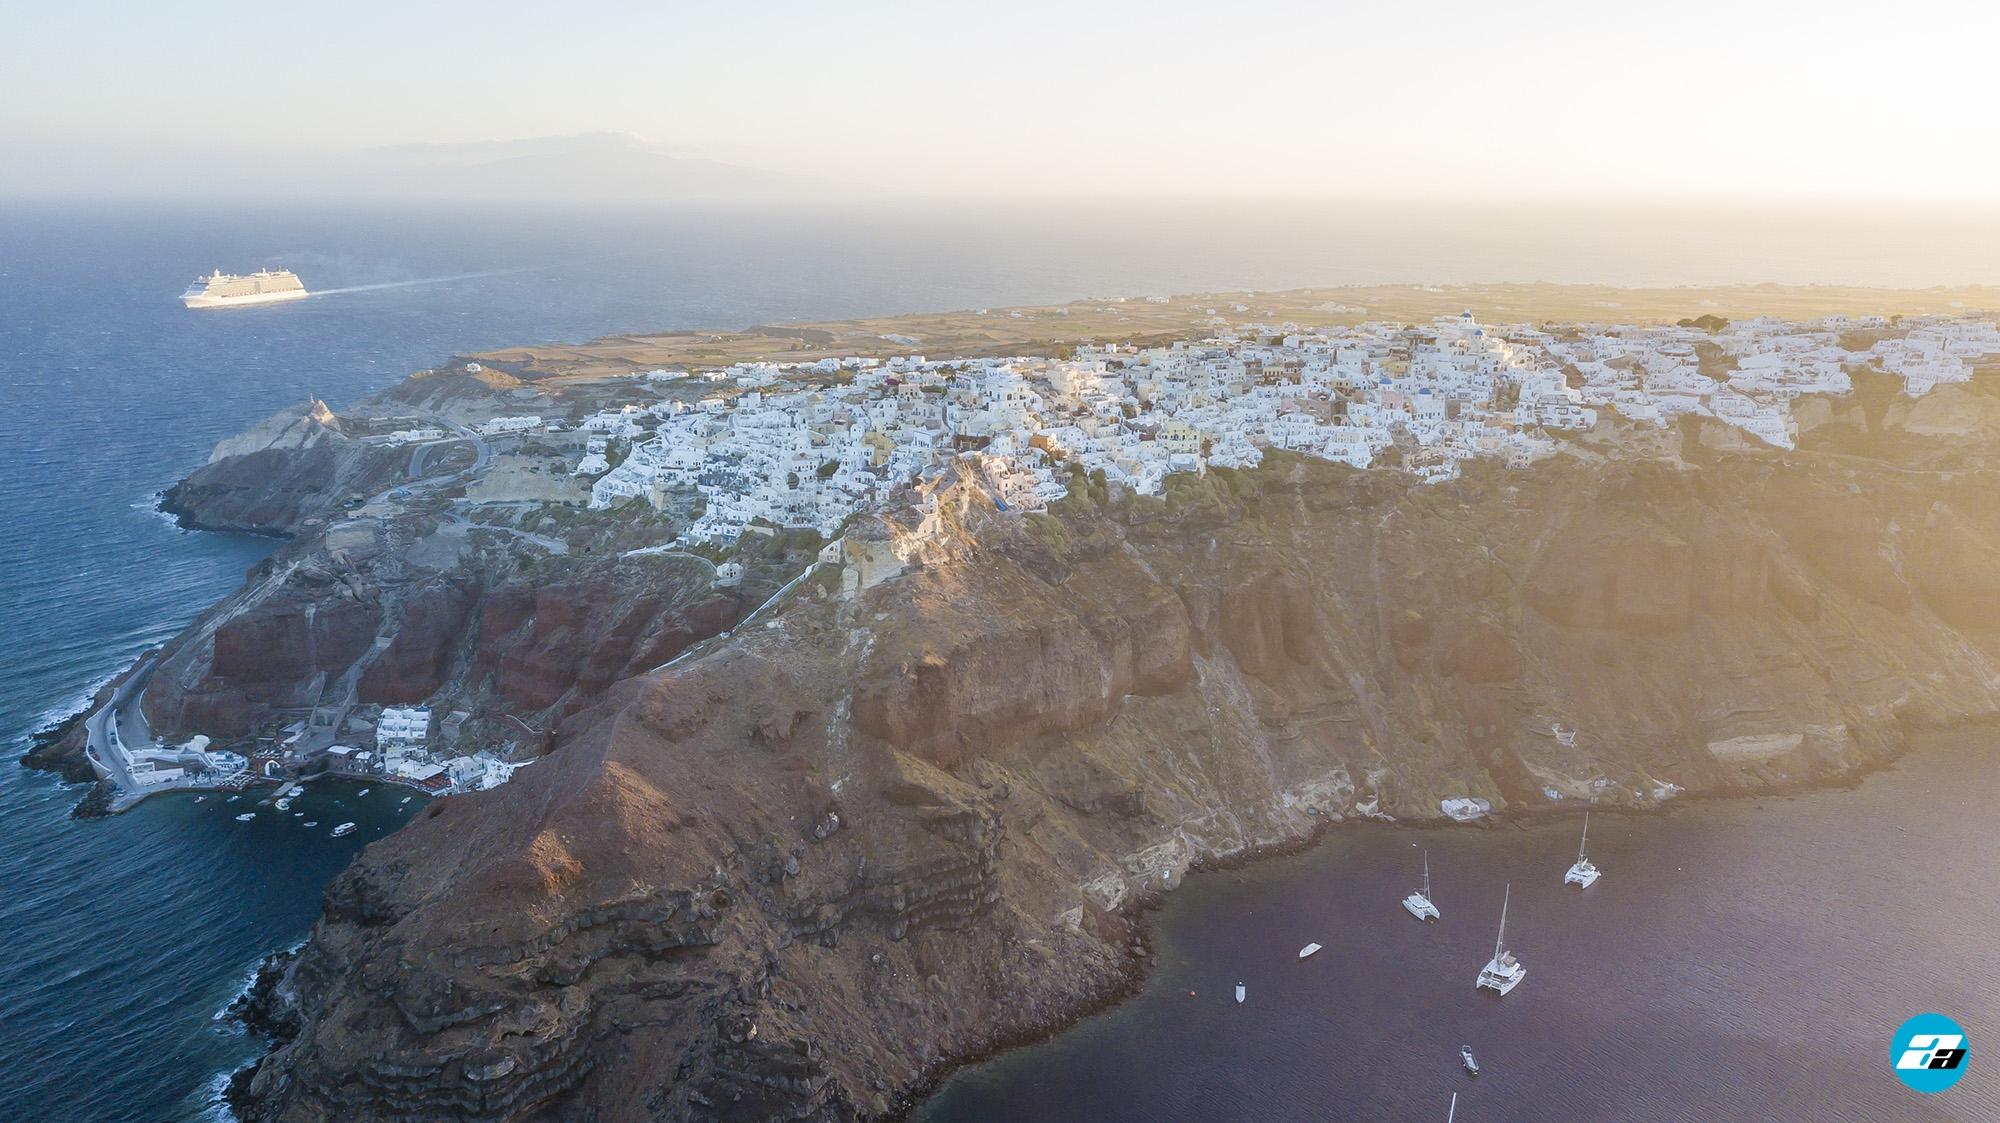 Oia Santorini Greece. Oia from above. Aerial photo.